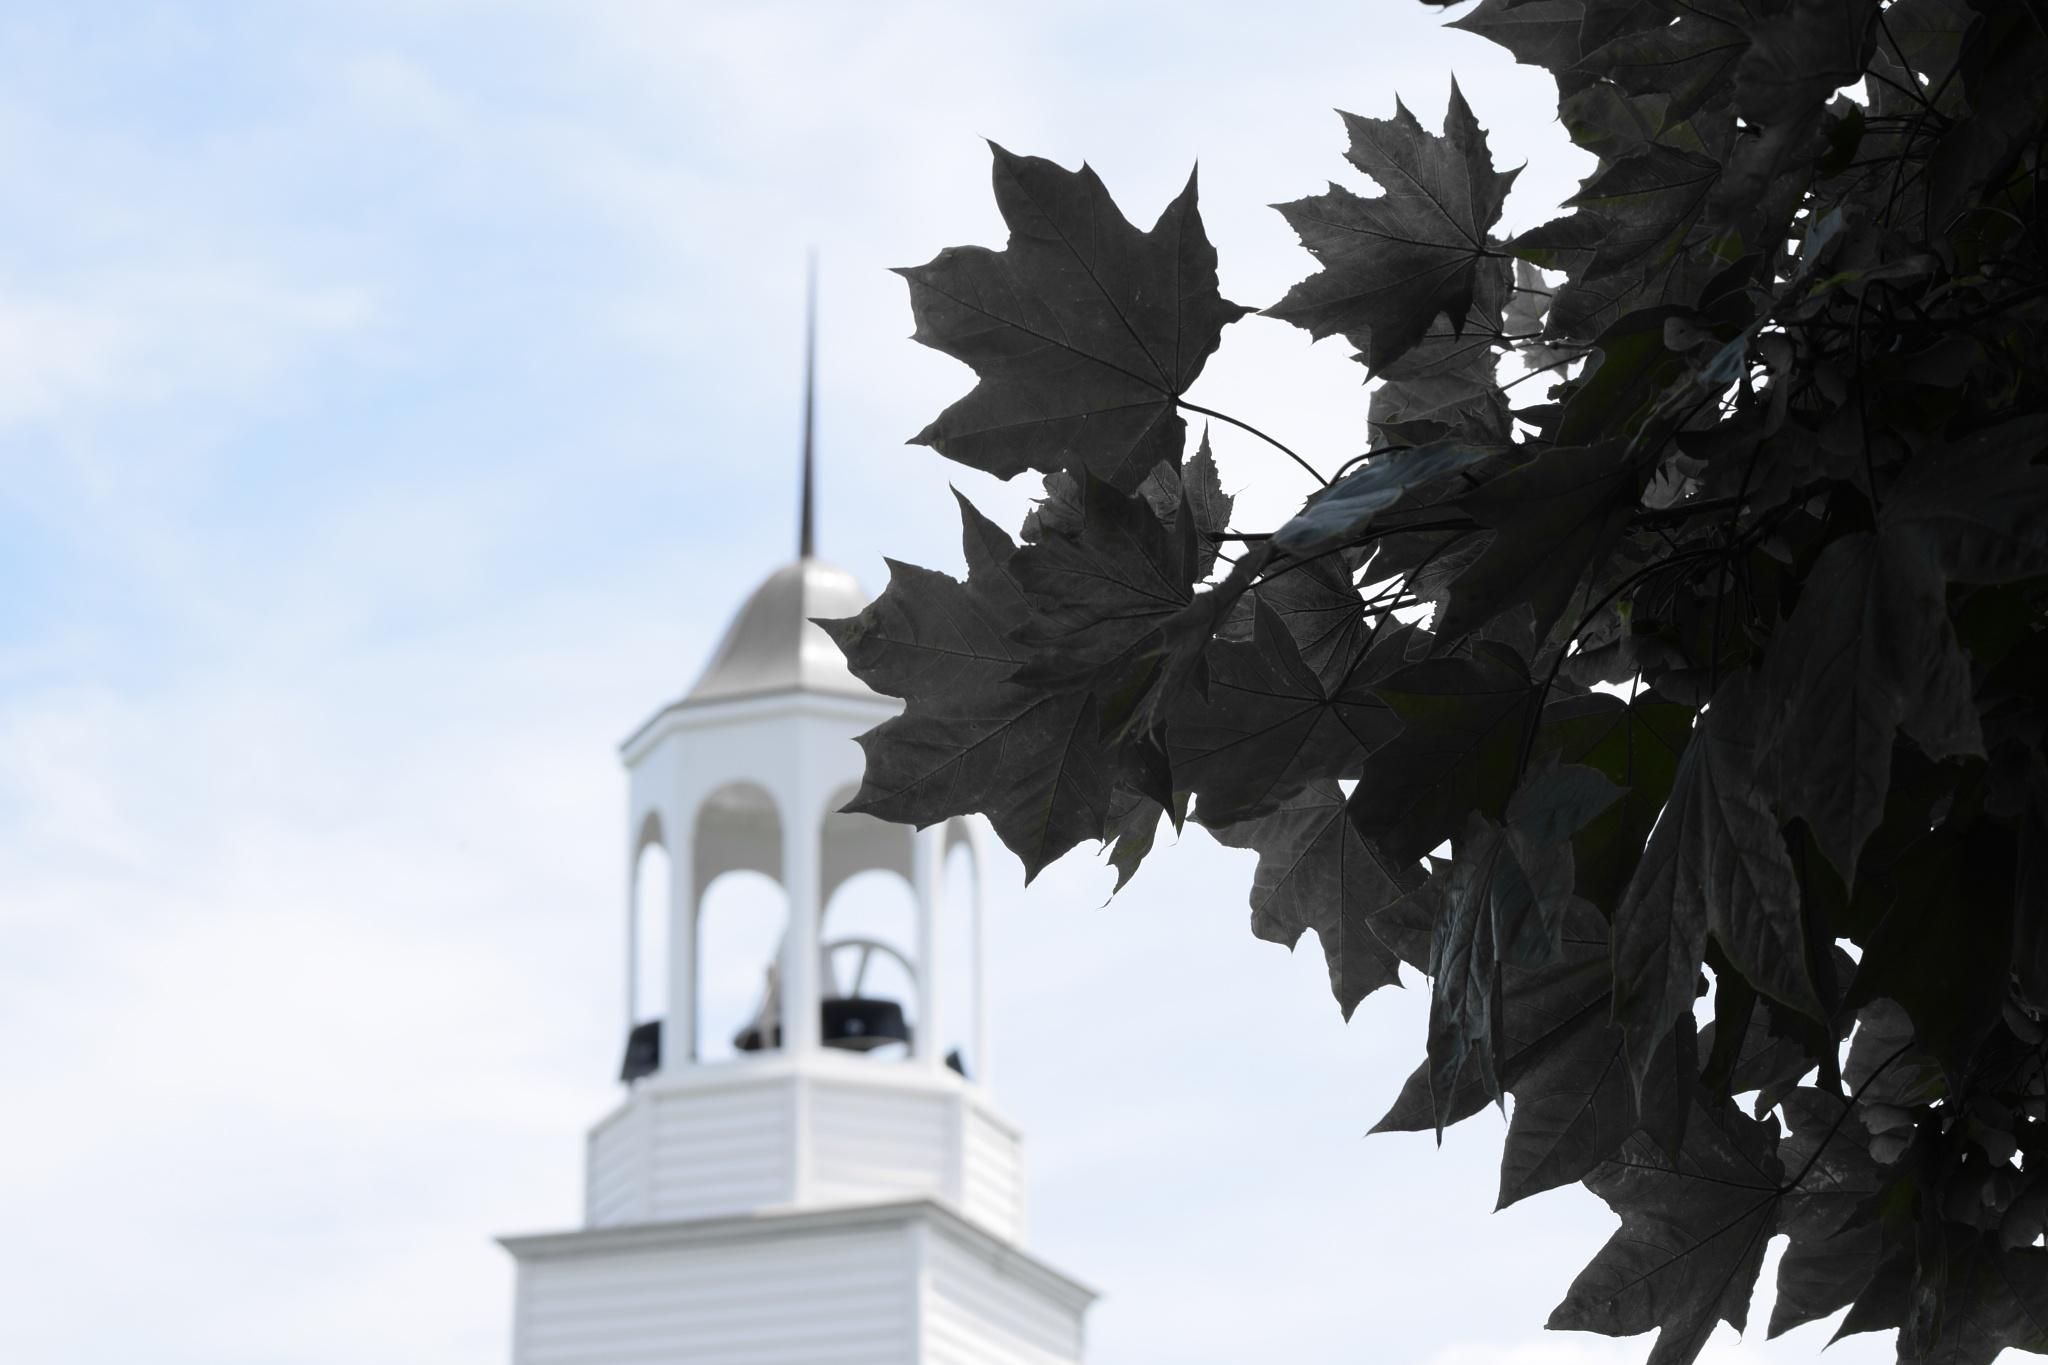 Church Steeple by Tegrey